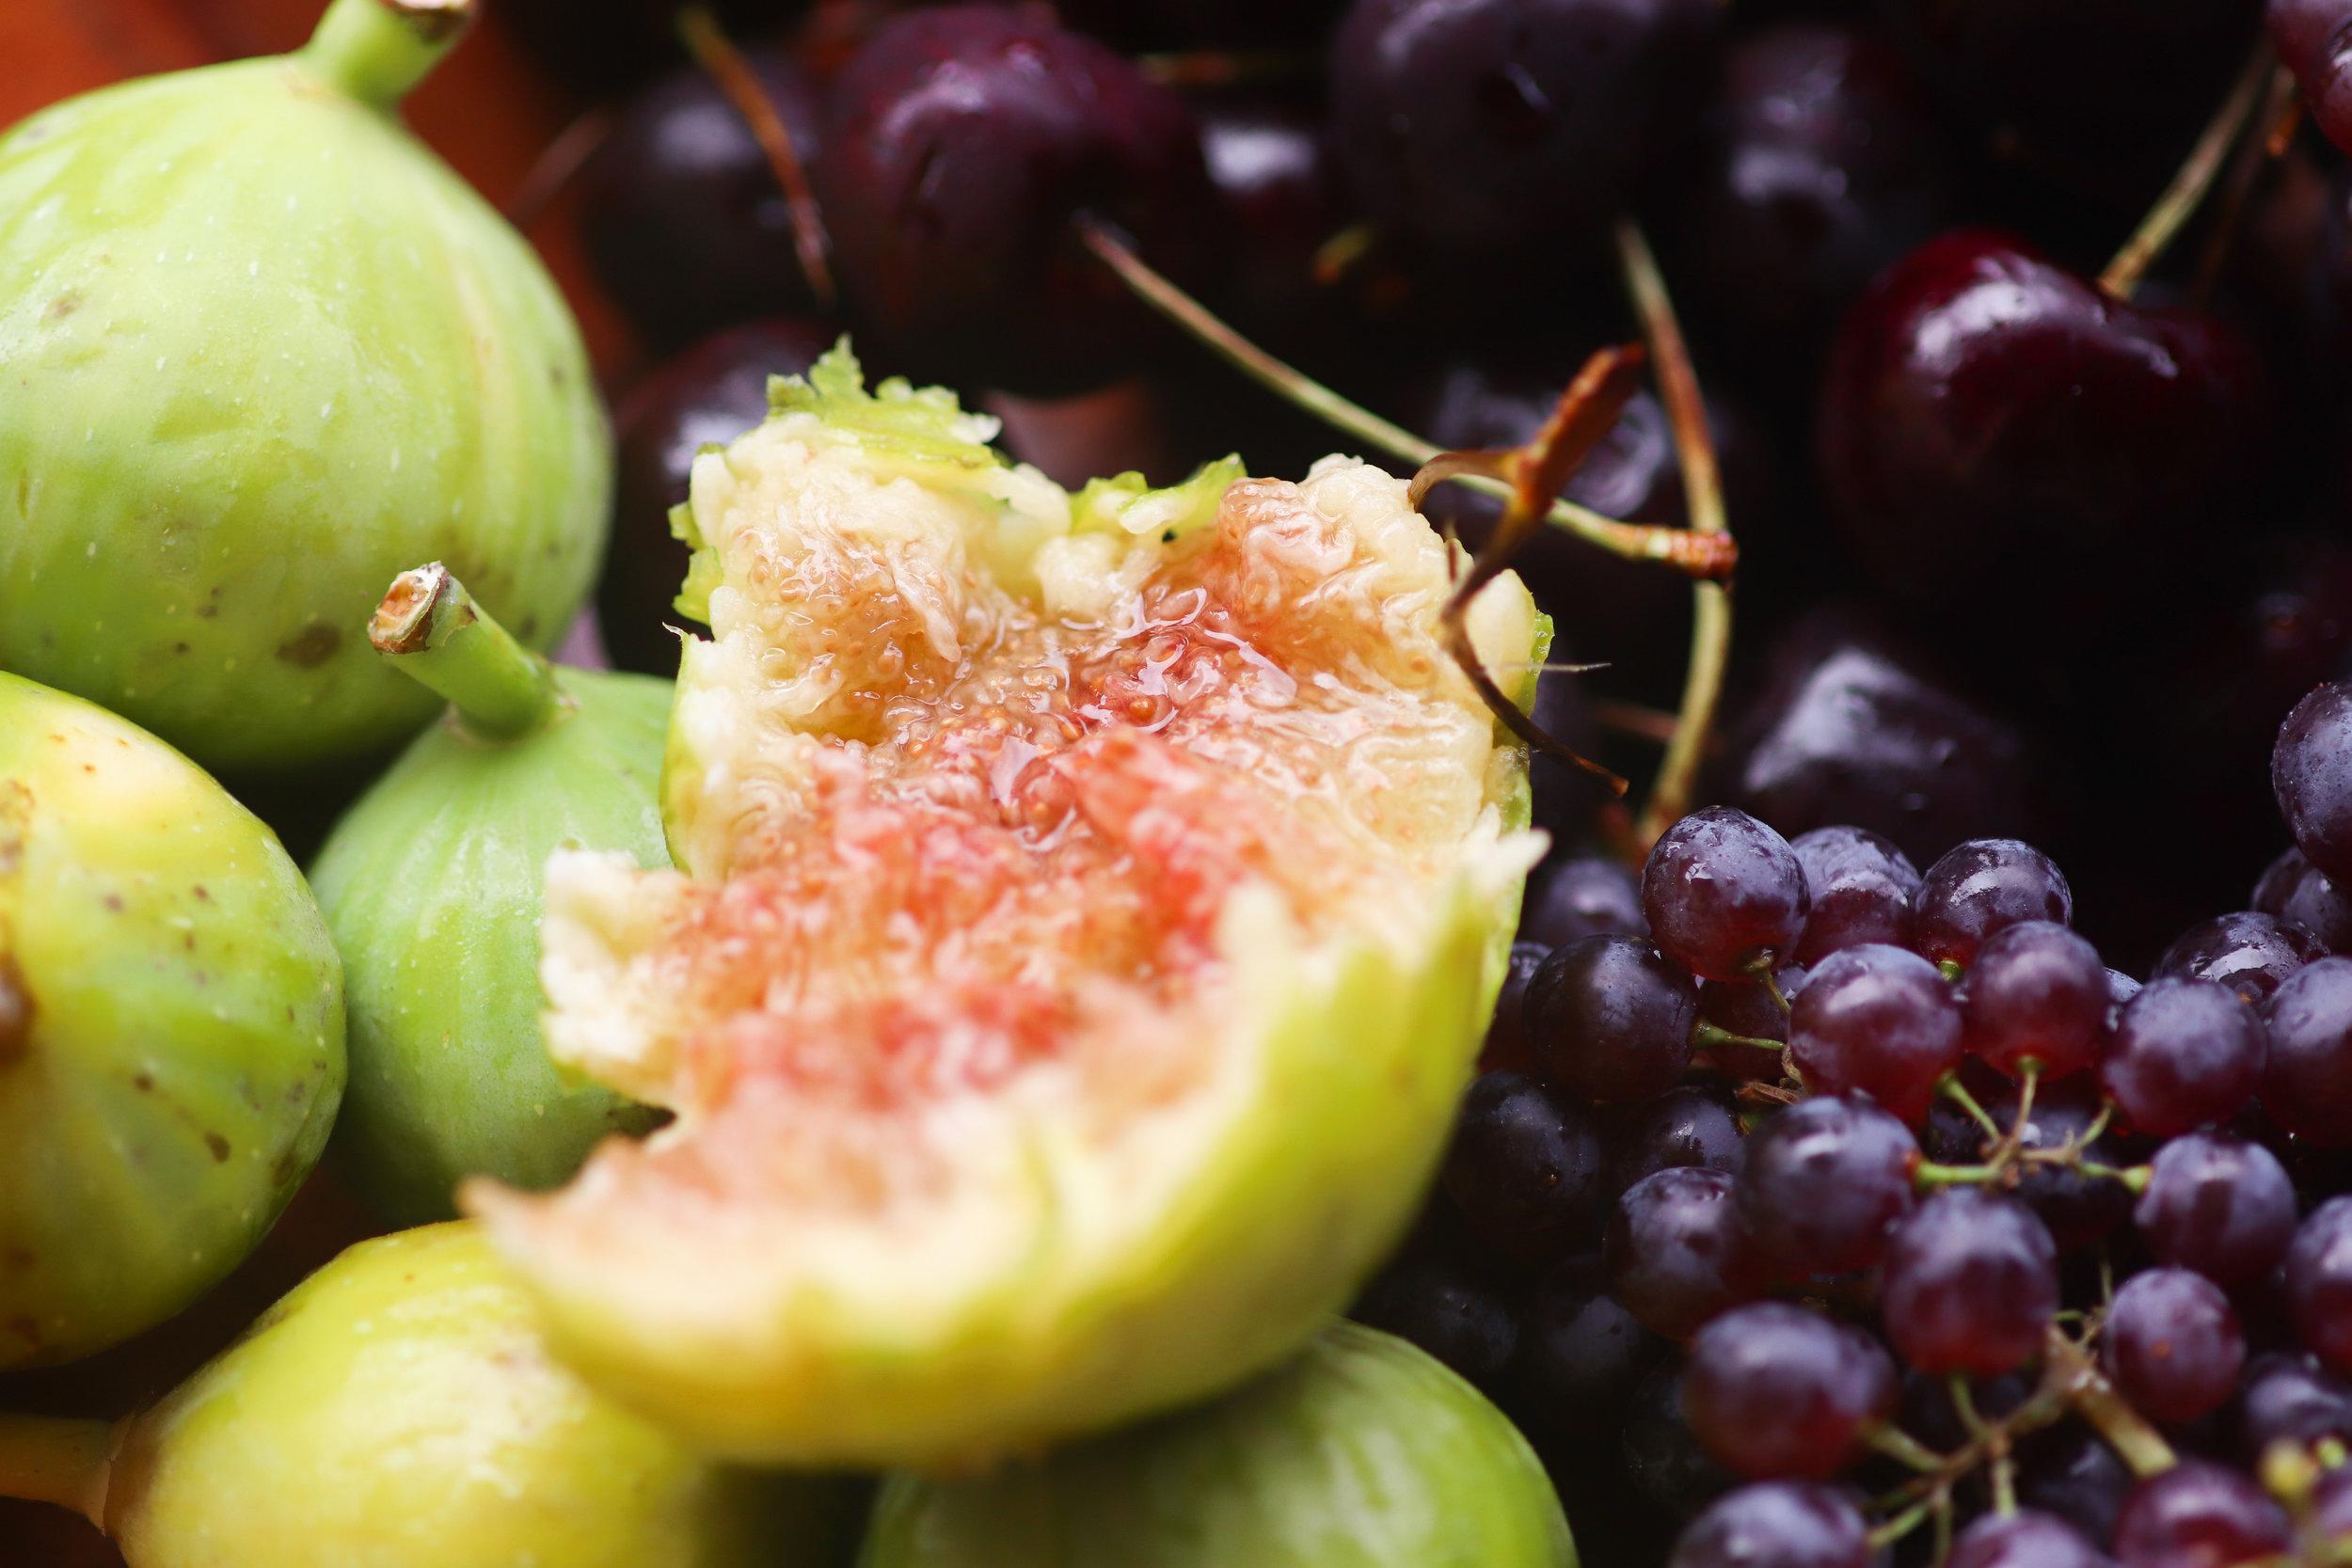 Fresh figs that melt like jam on your tongue.